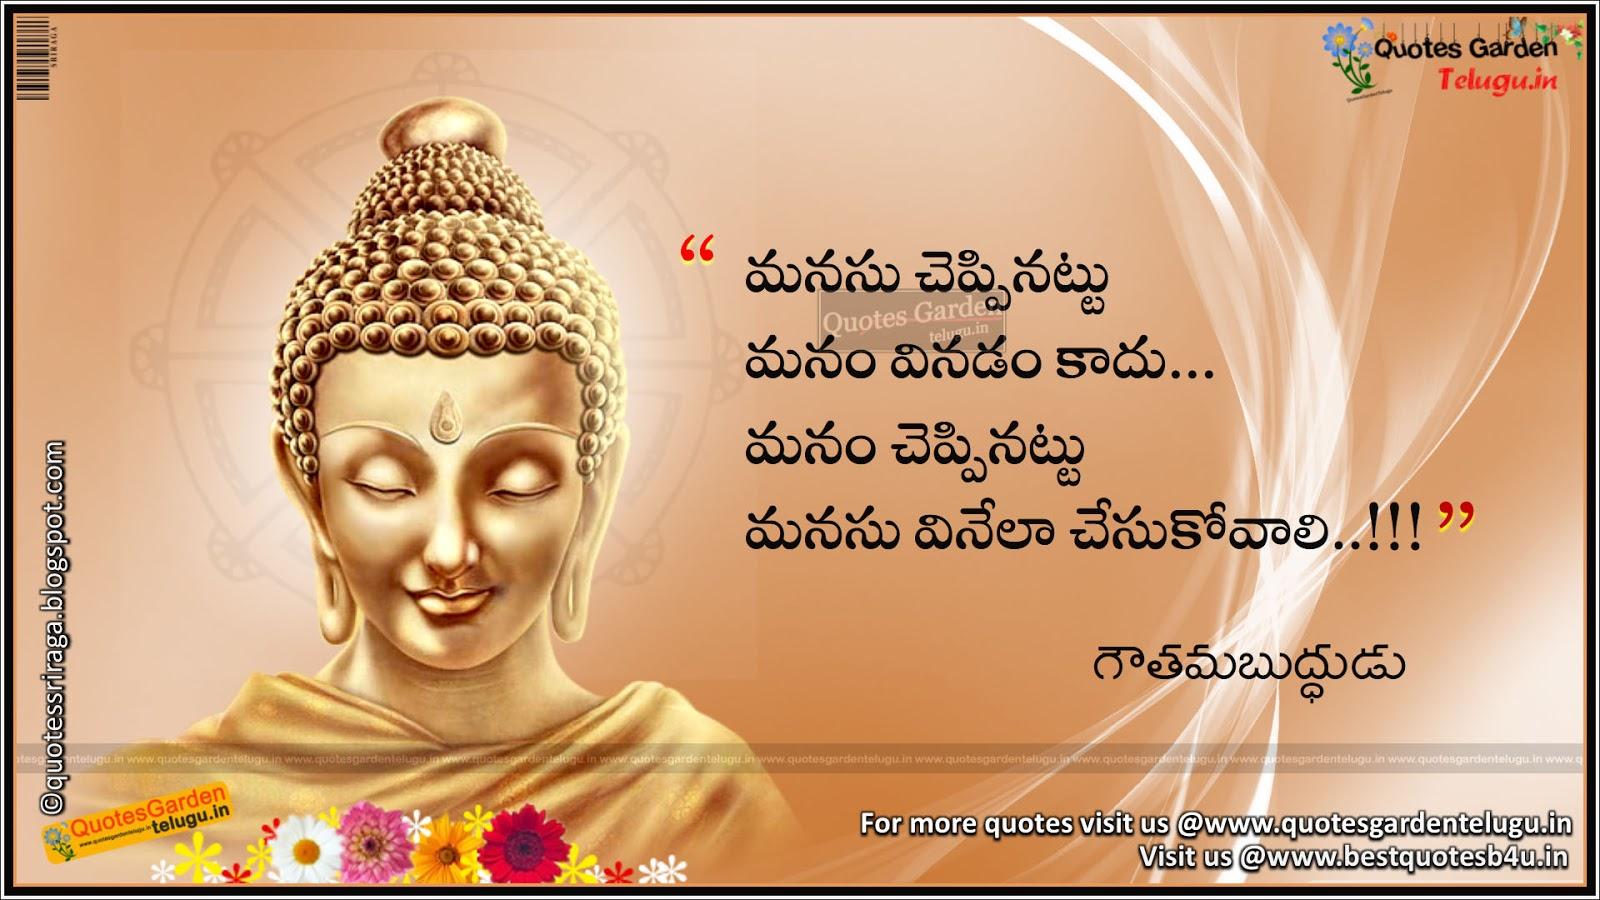 Best Telugu Gautama Buddha Quotations